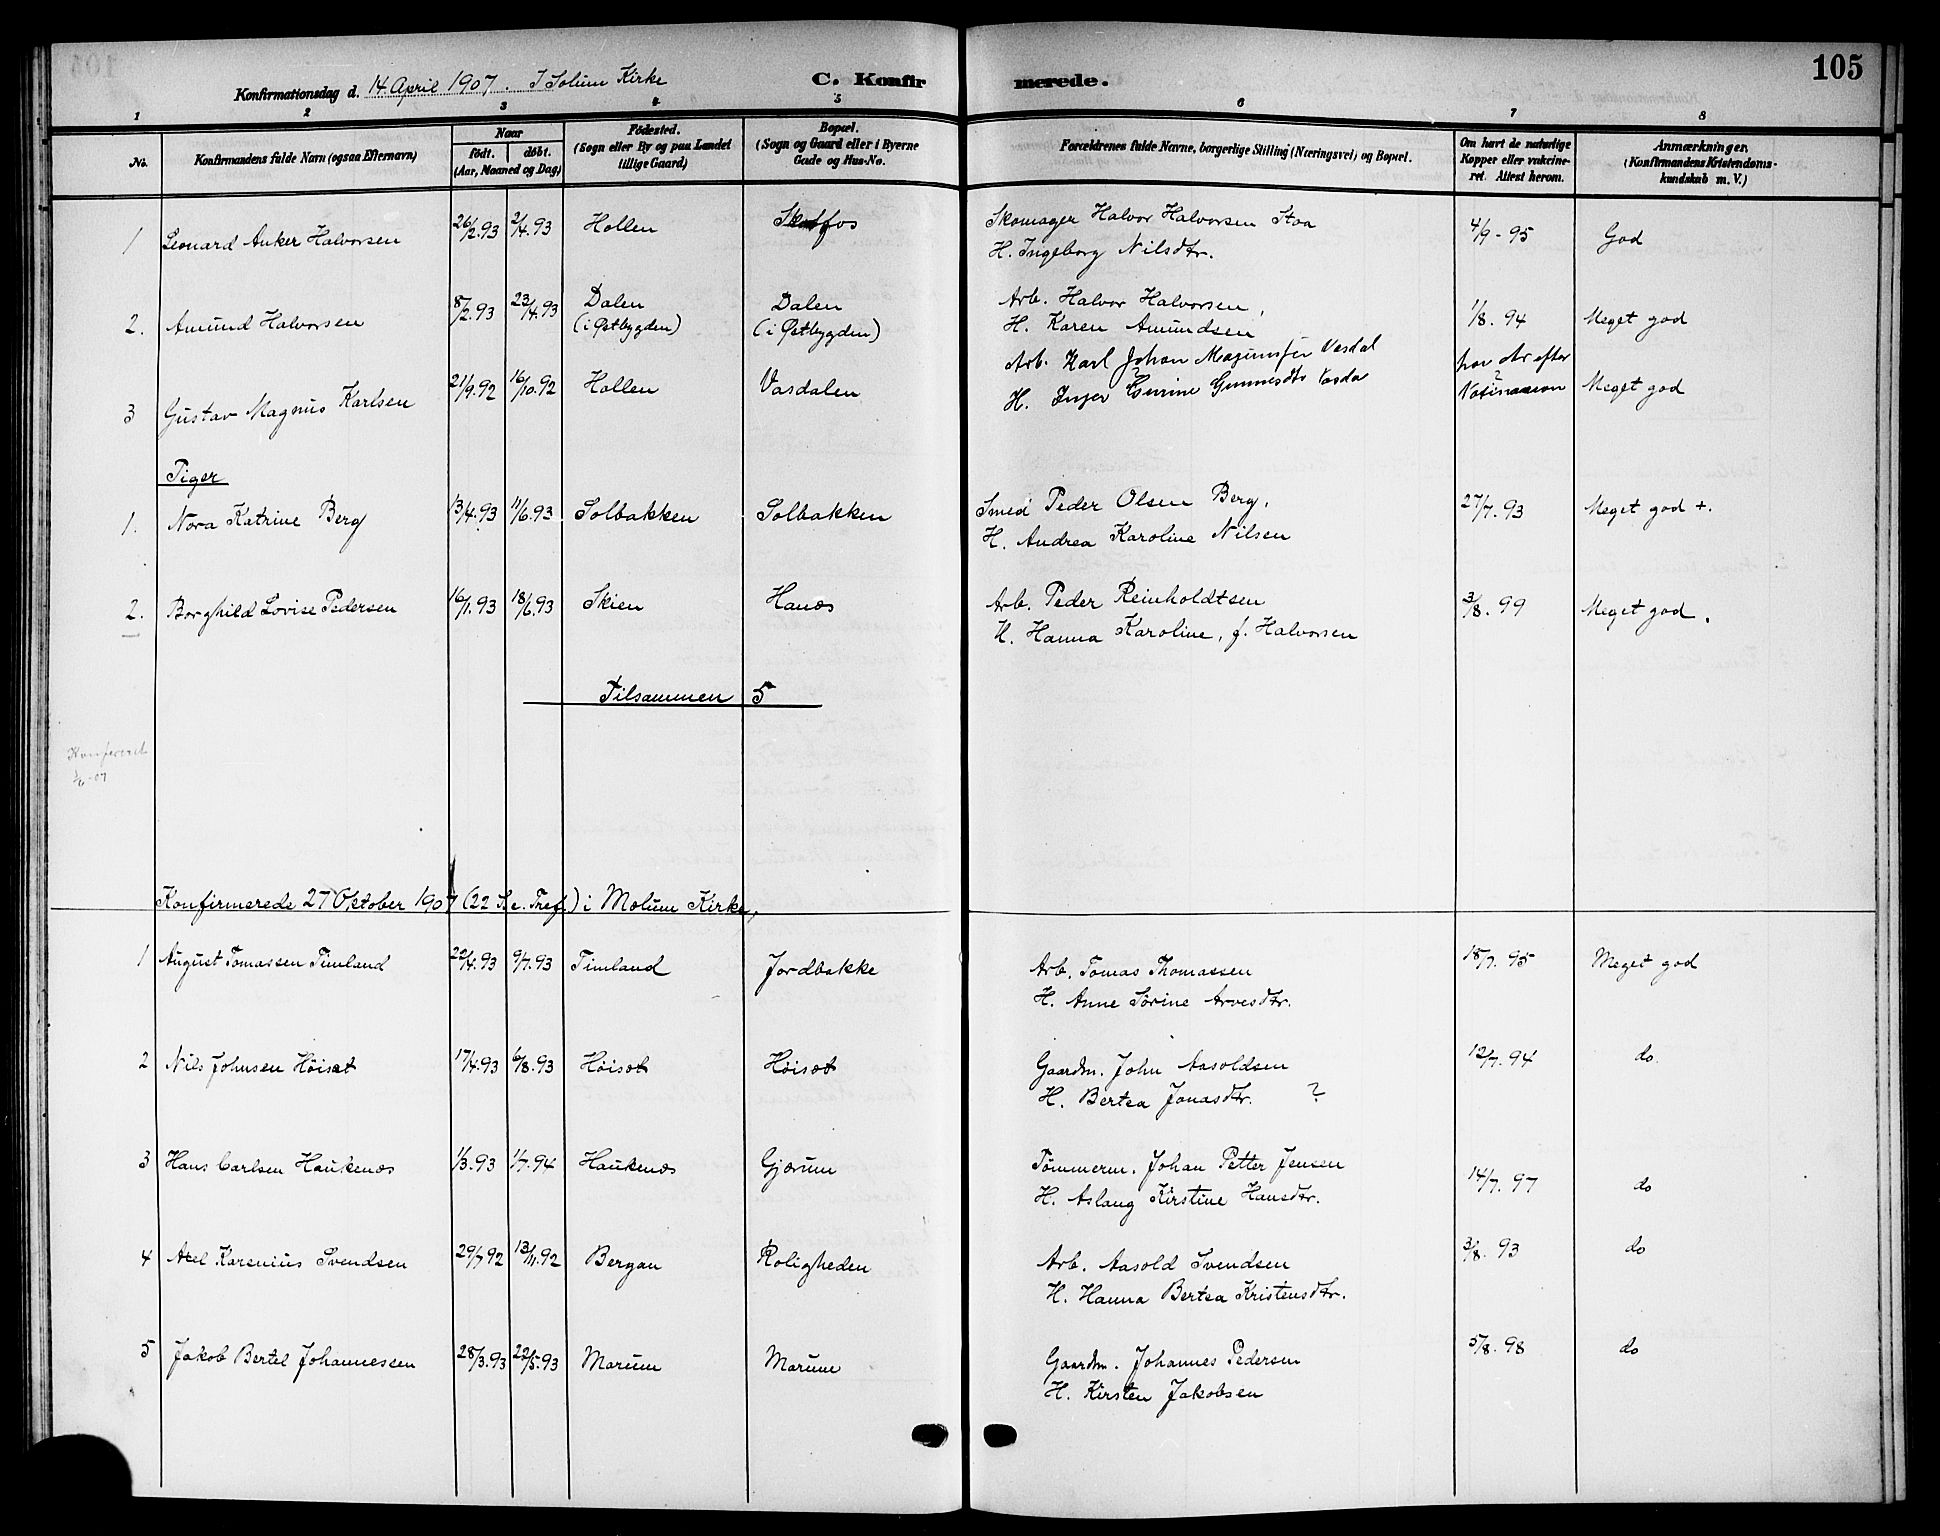 SAKO, Solum kirkebøker, G/Gb/L0005: Klokkerbok nr. II 5, 1905-1914, s. 105